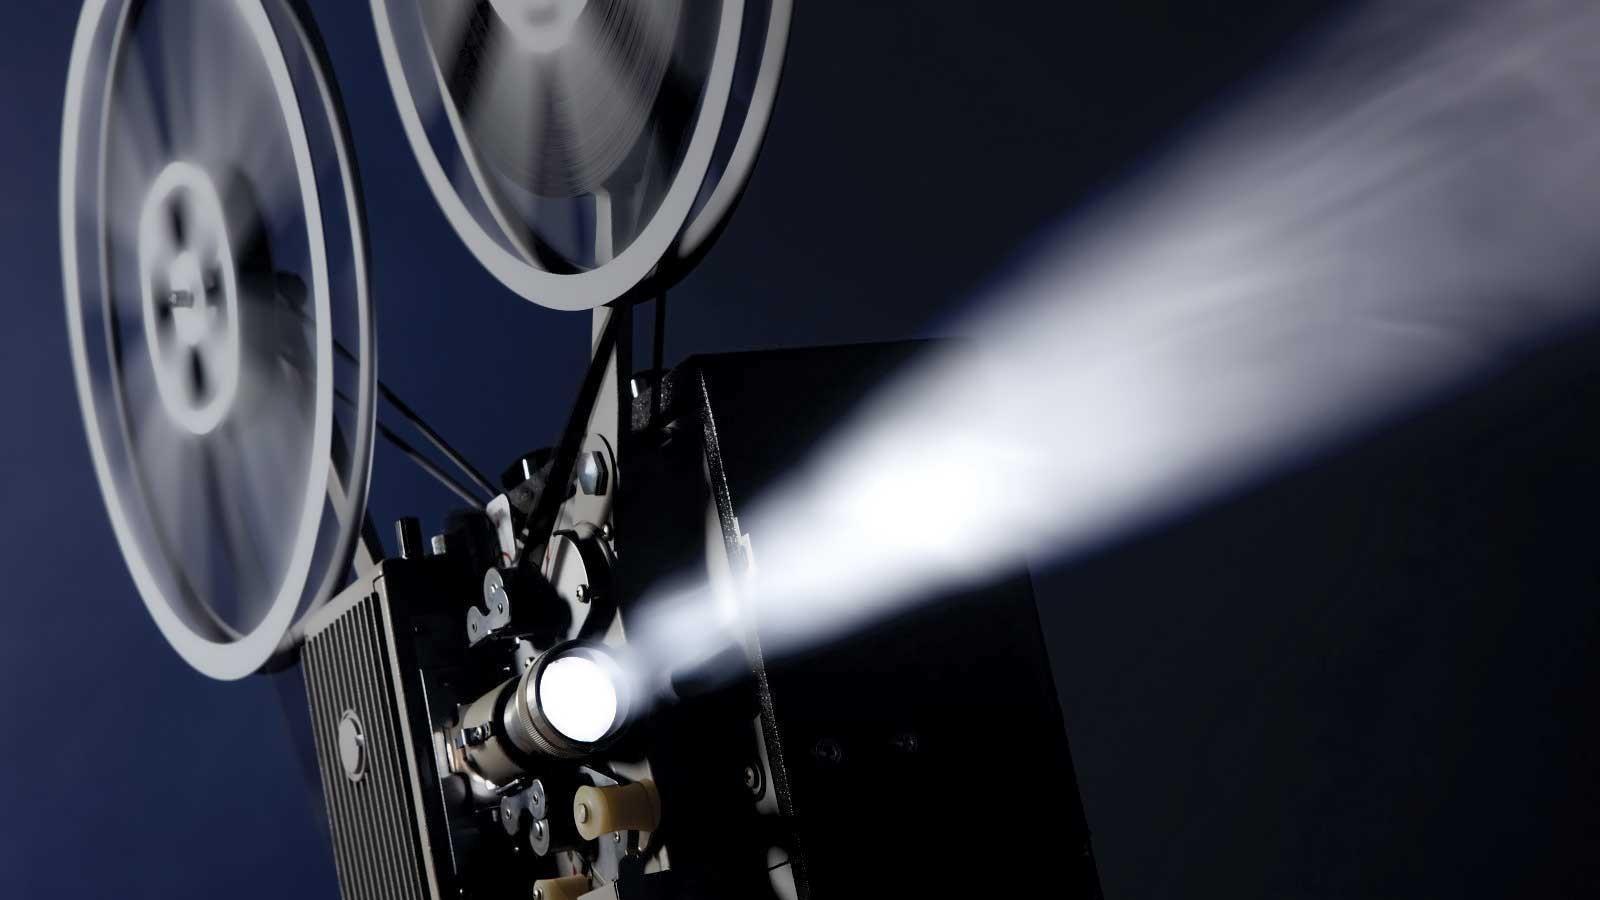 Ampliado prazo da MP que beneficia setor cinematográfico